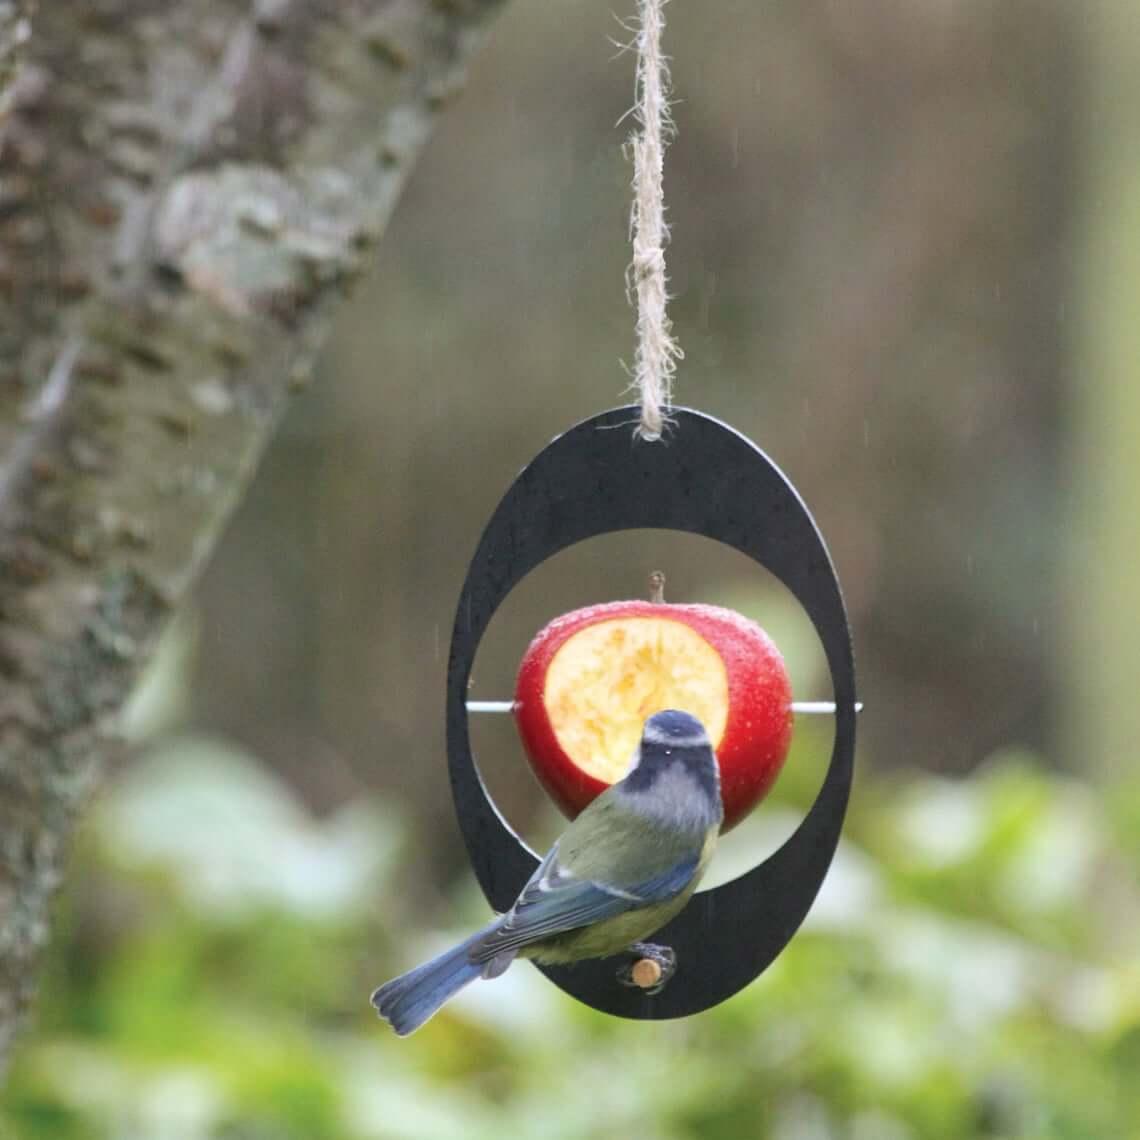 Eco-Friendly Bird Feeder for Fruit